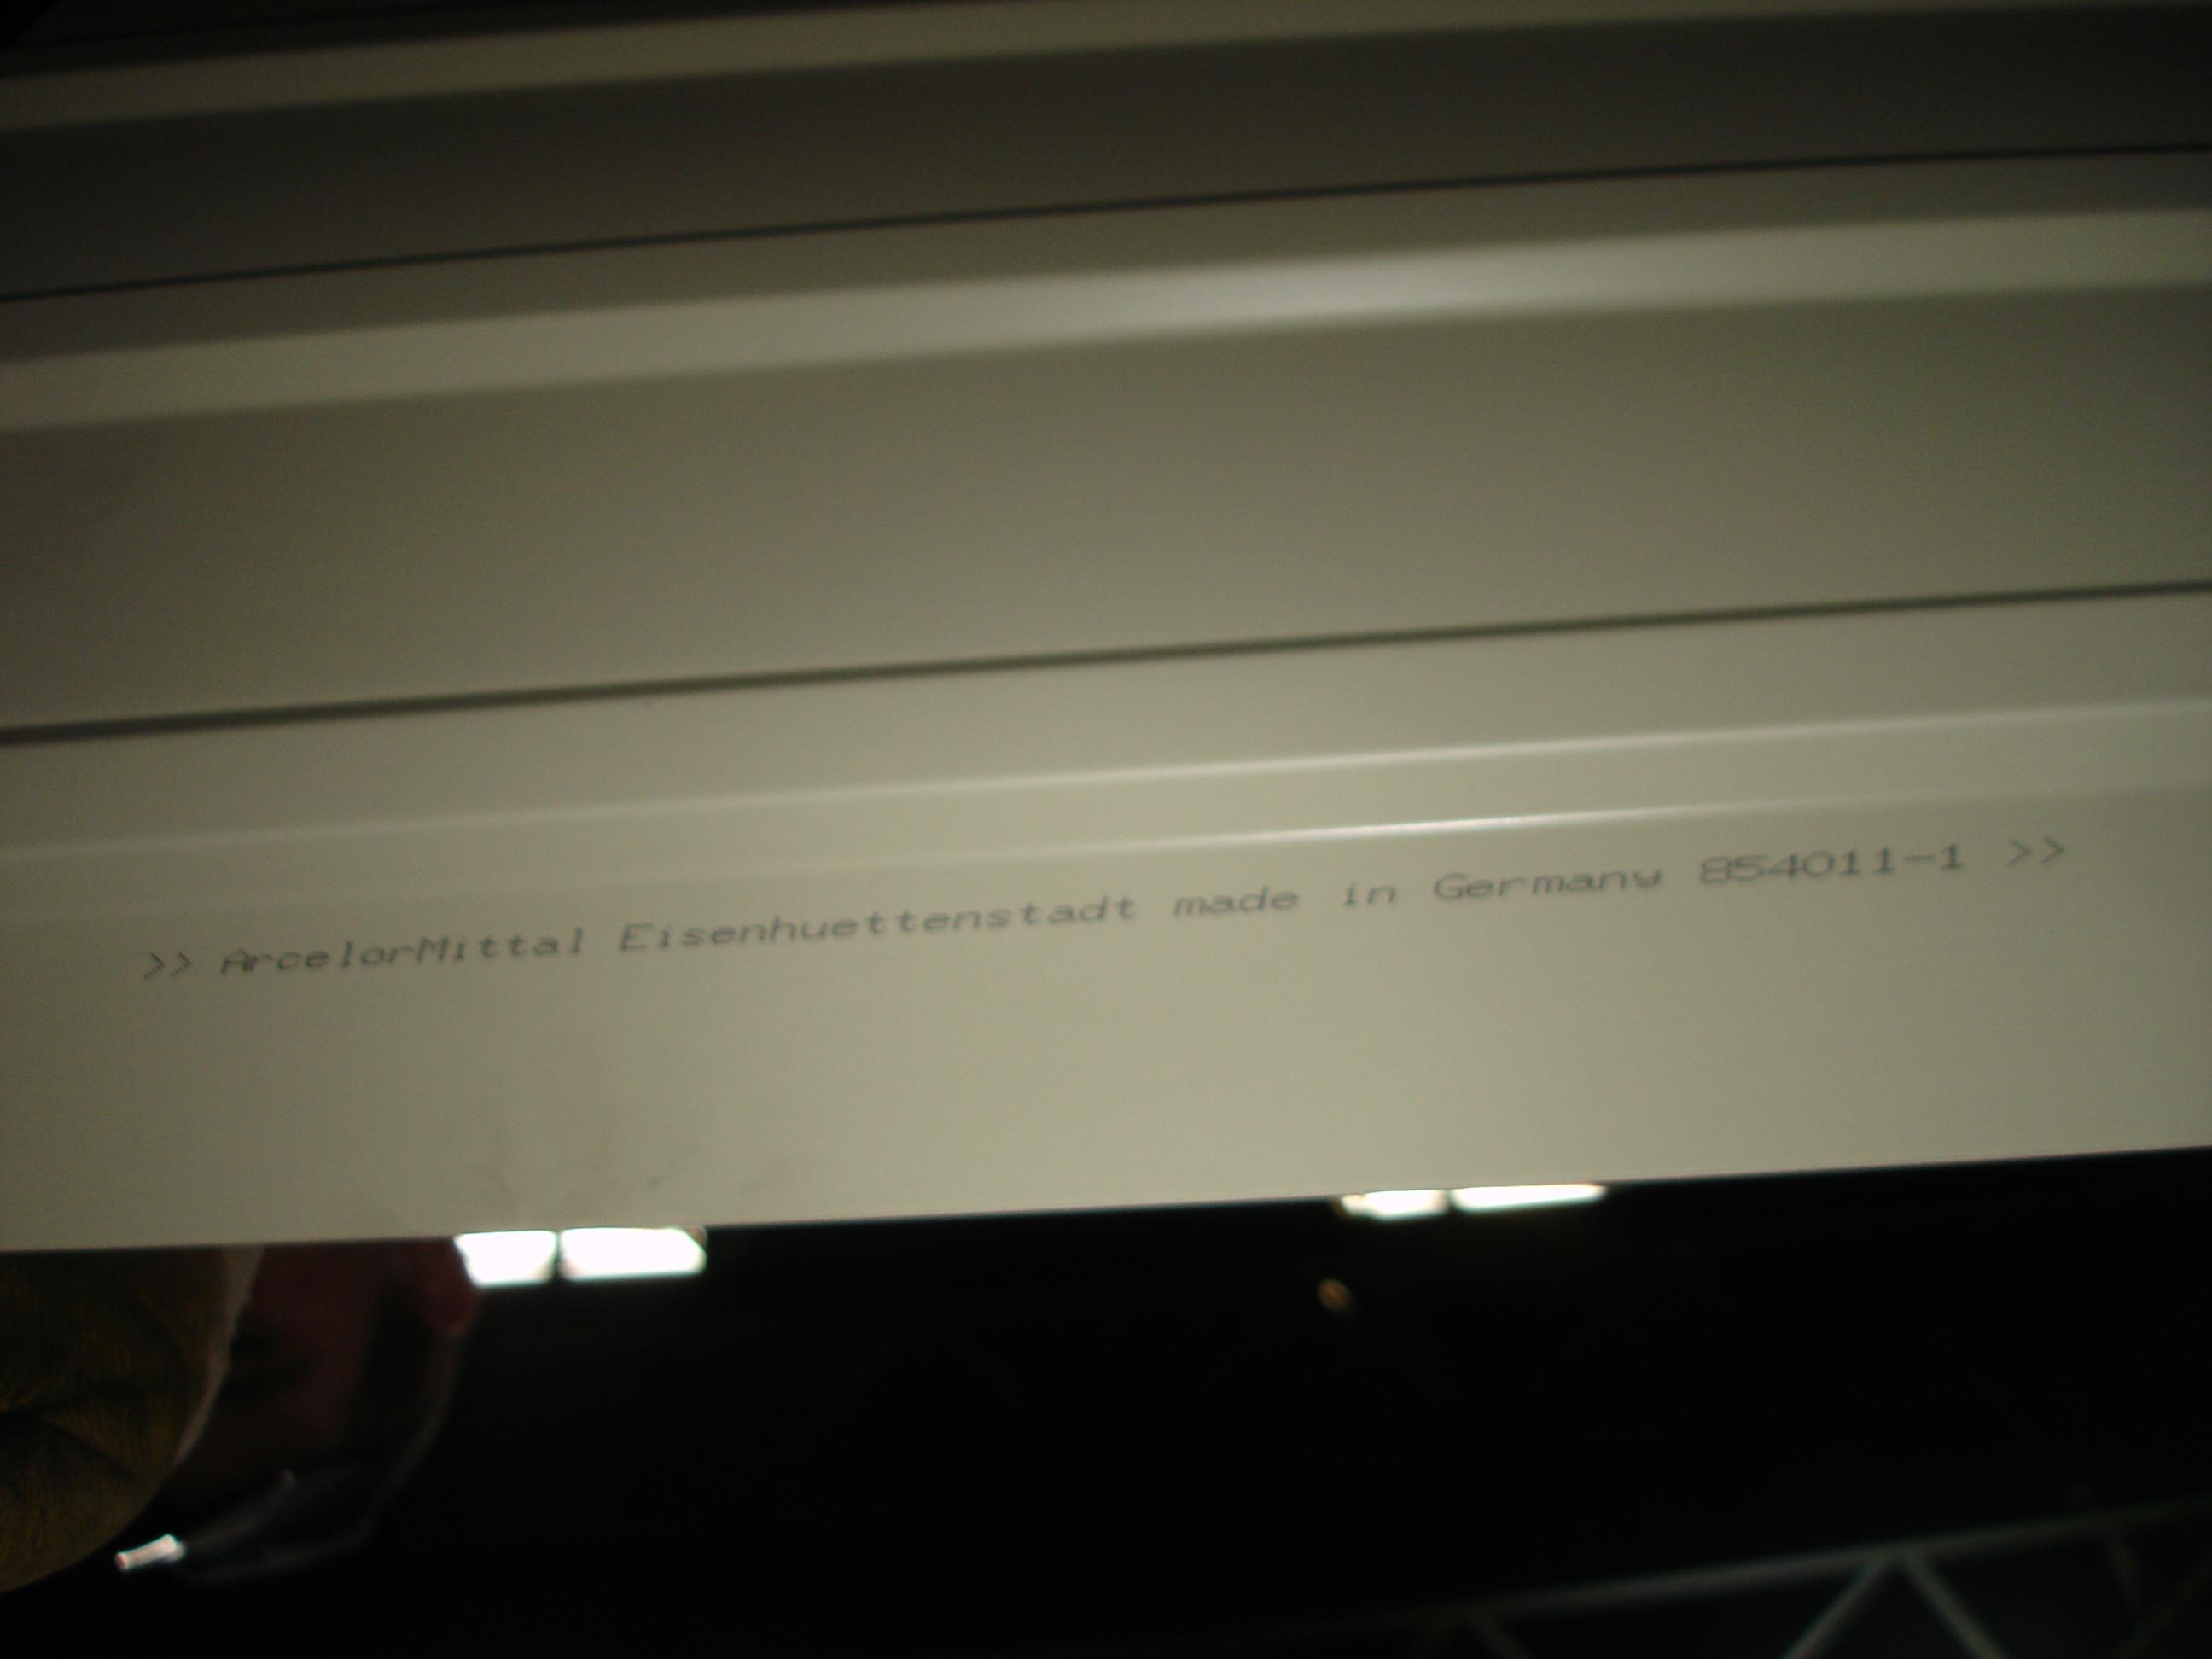 Нажмите на изображение для увеличения Название: Made in Germany 1.JPG Просмотров: 81 Размер:190.1 Кб ID:77203